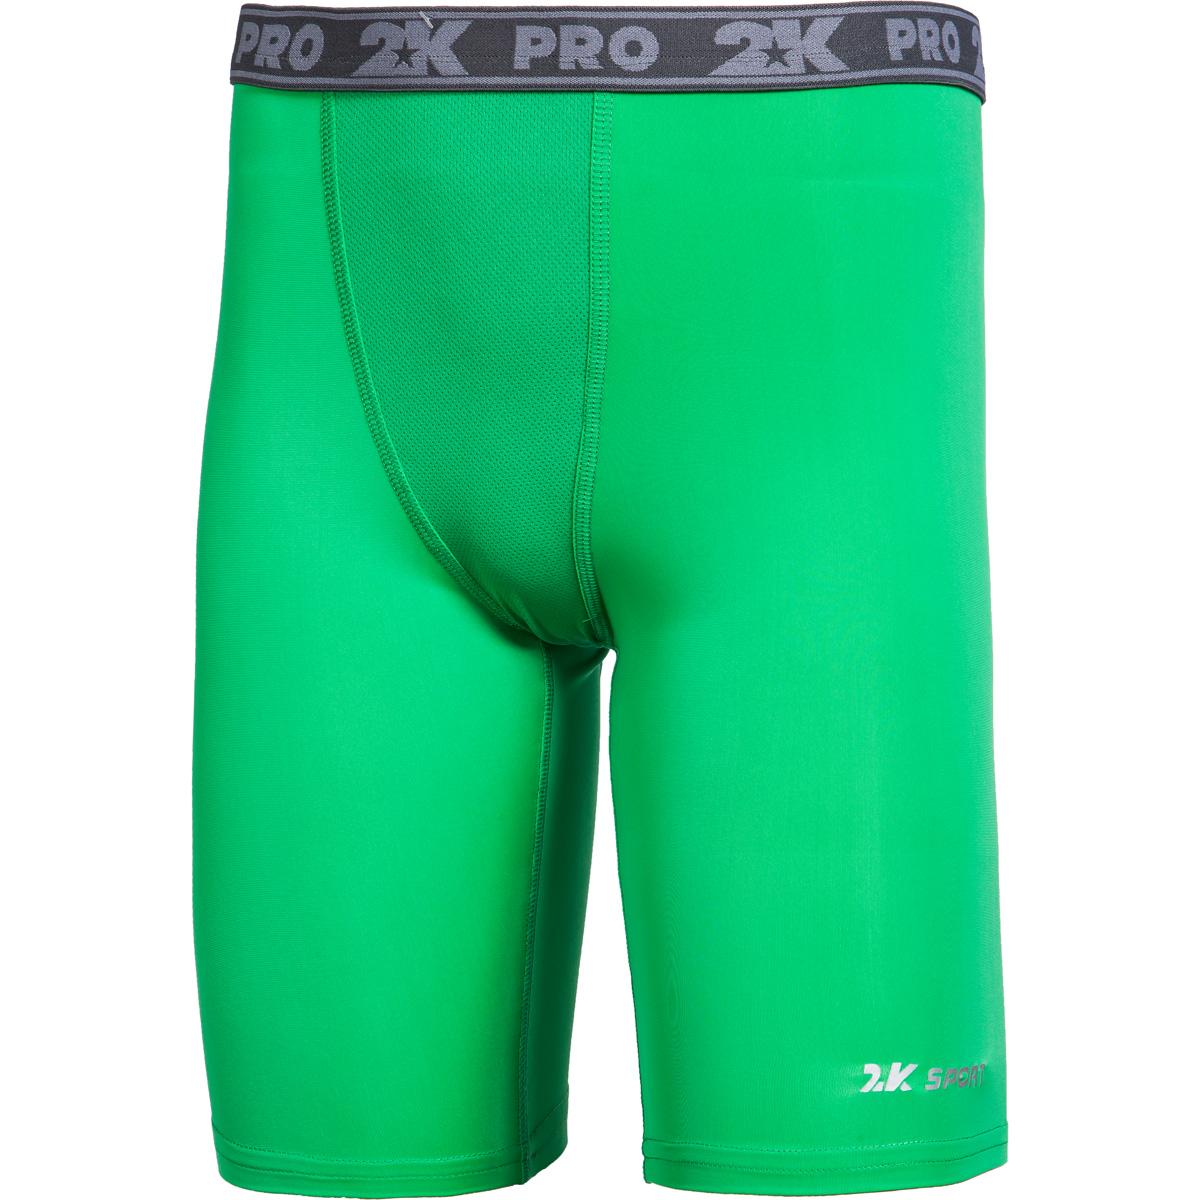 Тайтсы 2K Sport Team, цвет: зеленый. 120815. Размер XS (44) 2k sport 2k sport fenix pro cotton ls